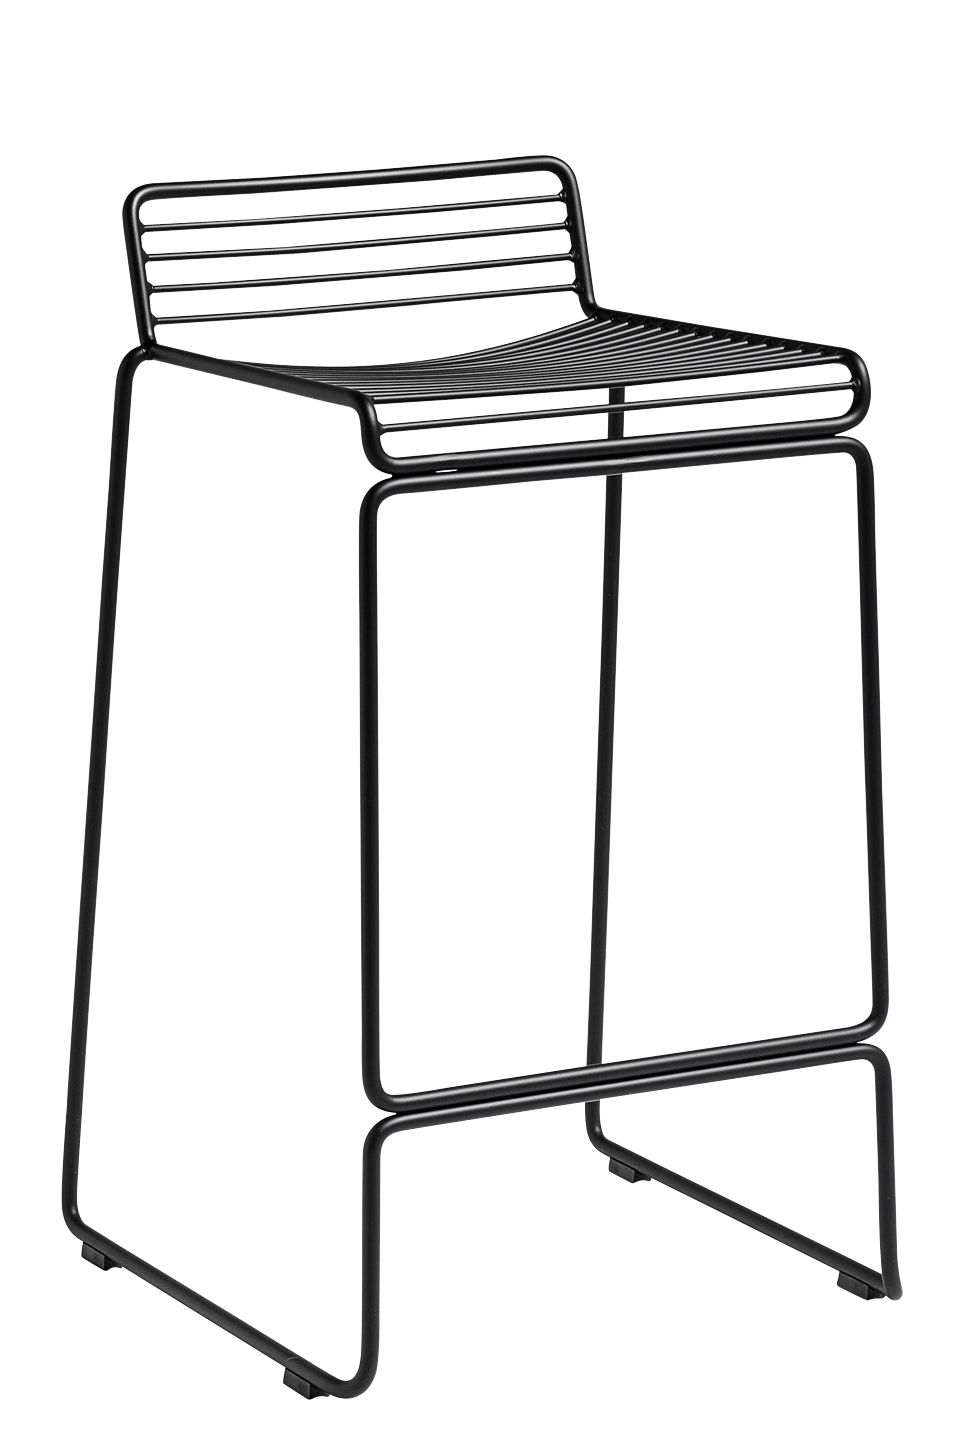 Möbel - Barhocker - Hee Barhocker / H 65 cm - Hay - Schwarz - lackierter Stahl